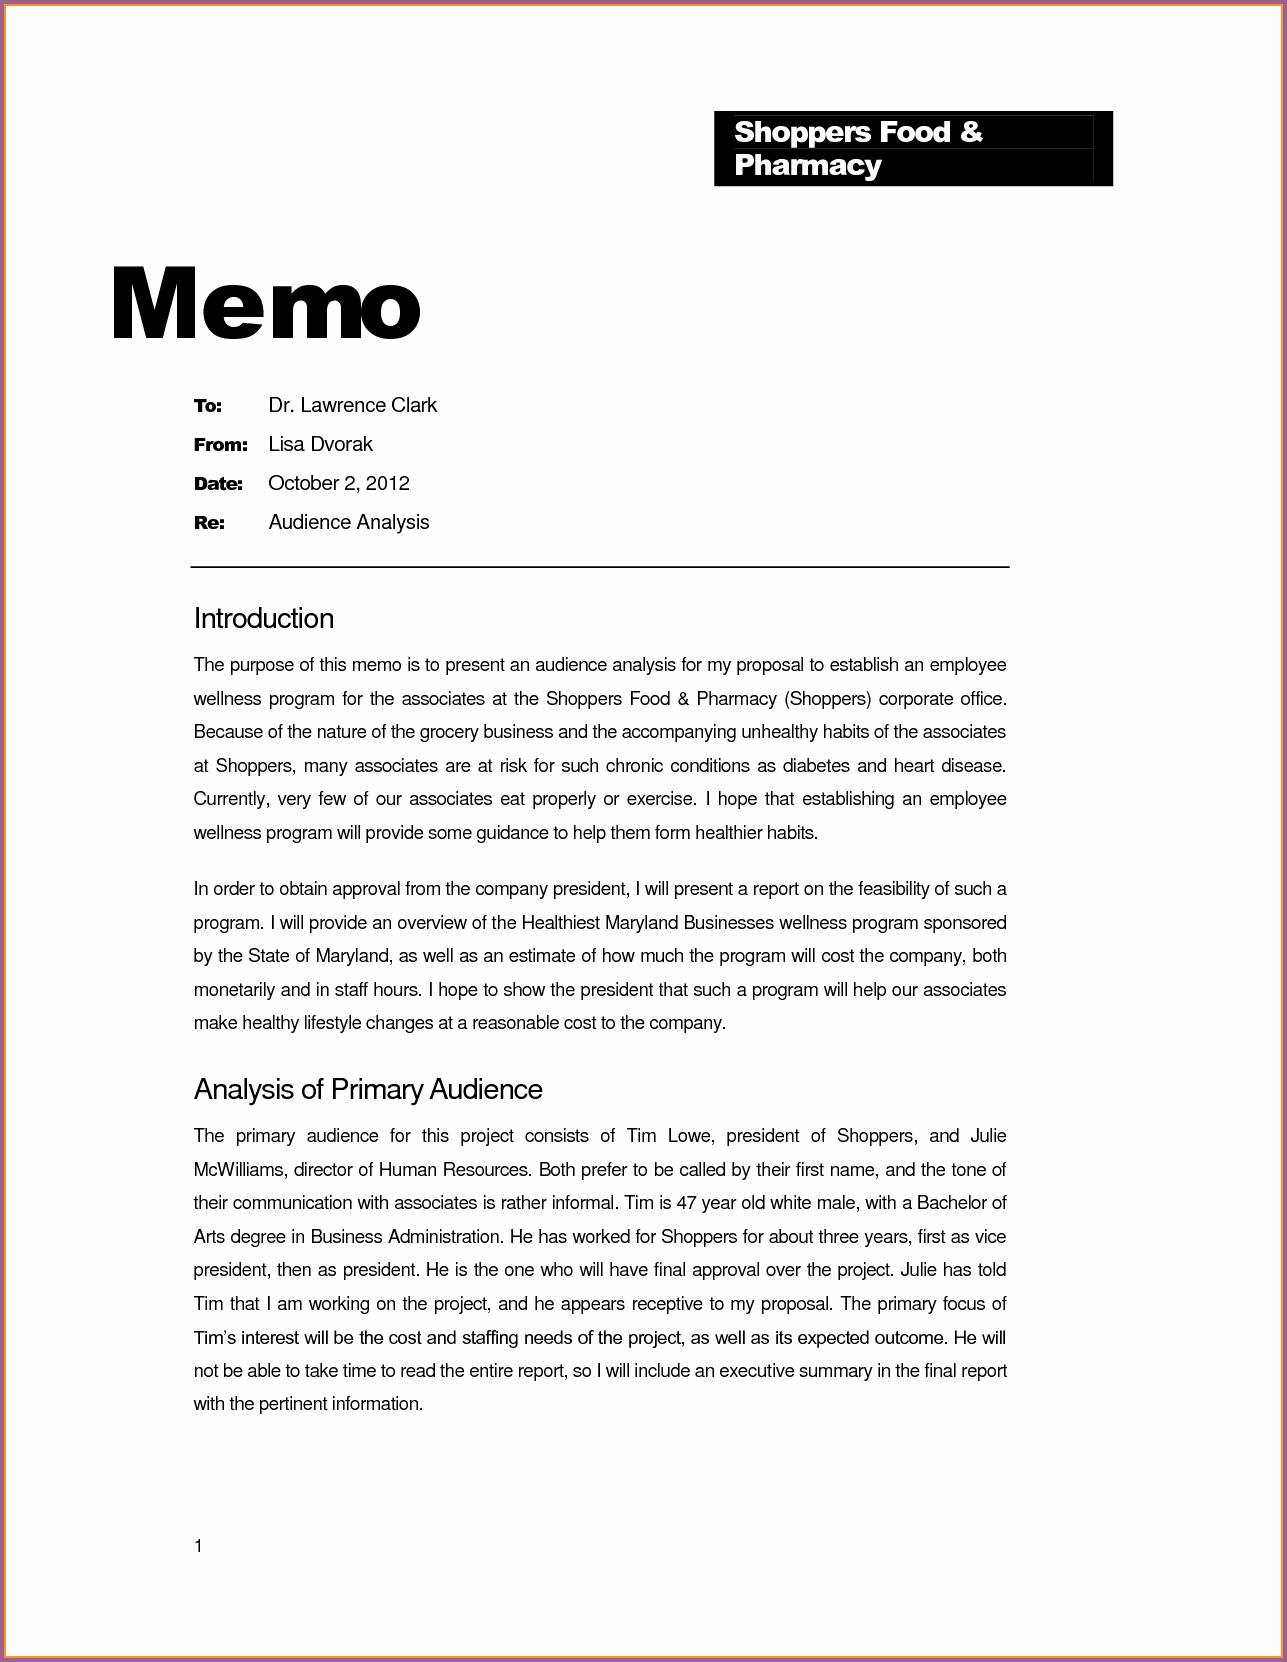 Ms Word Memo Templates Free Beautiful Memo Templates for Word Portablegasgrillweber